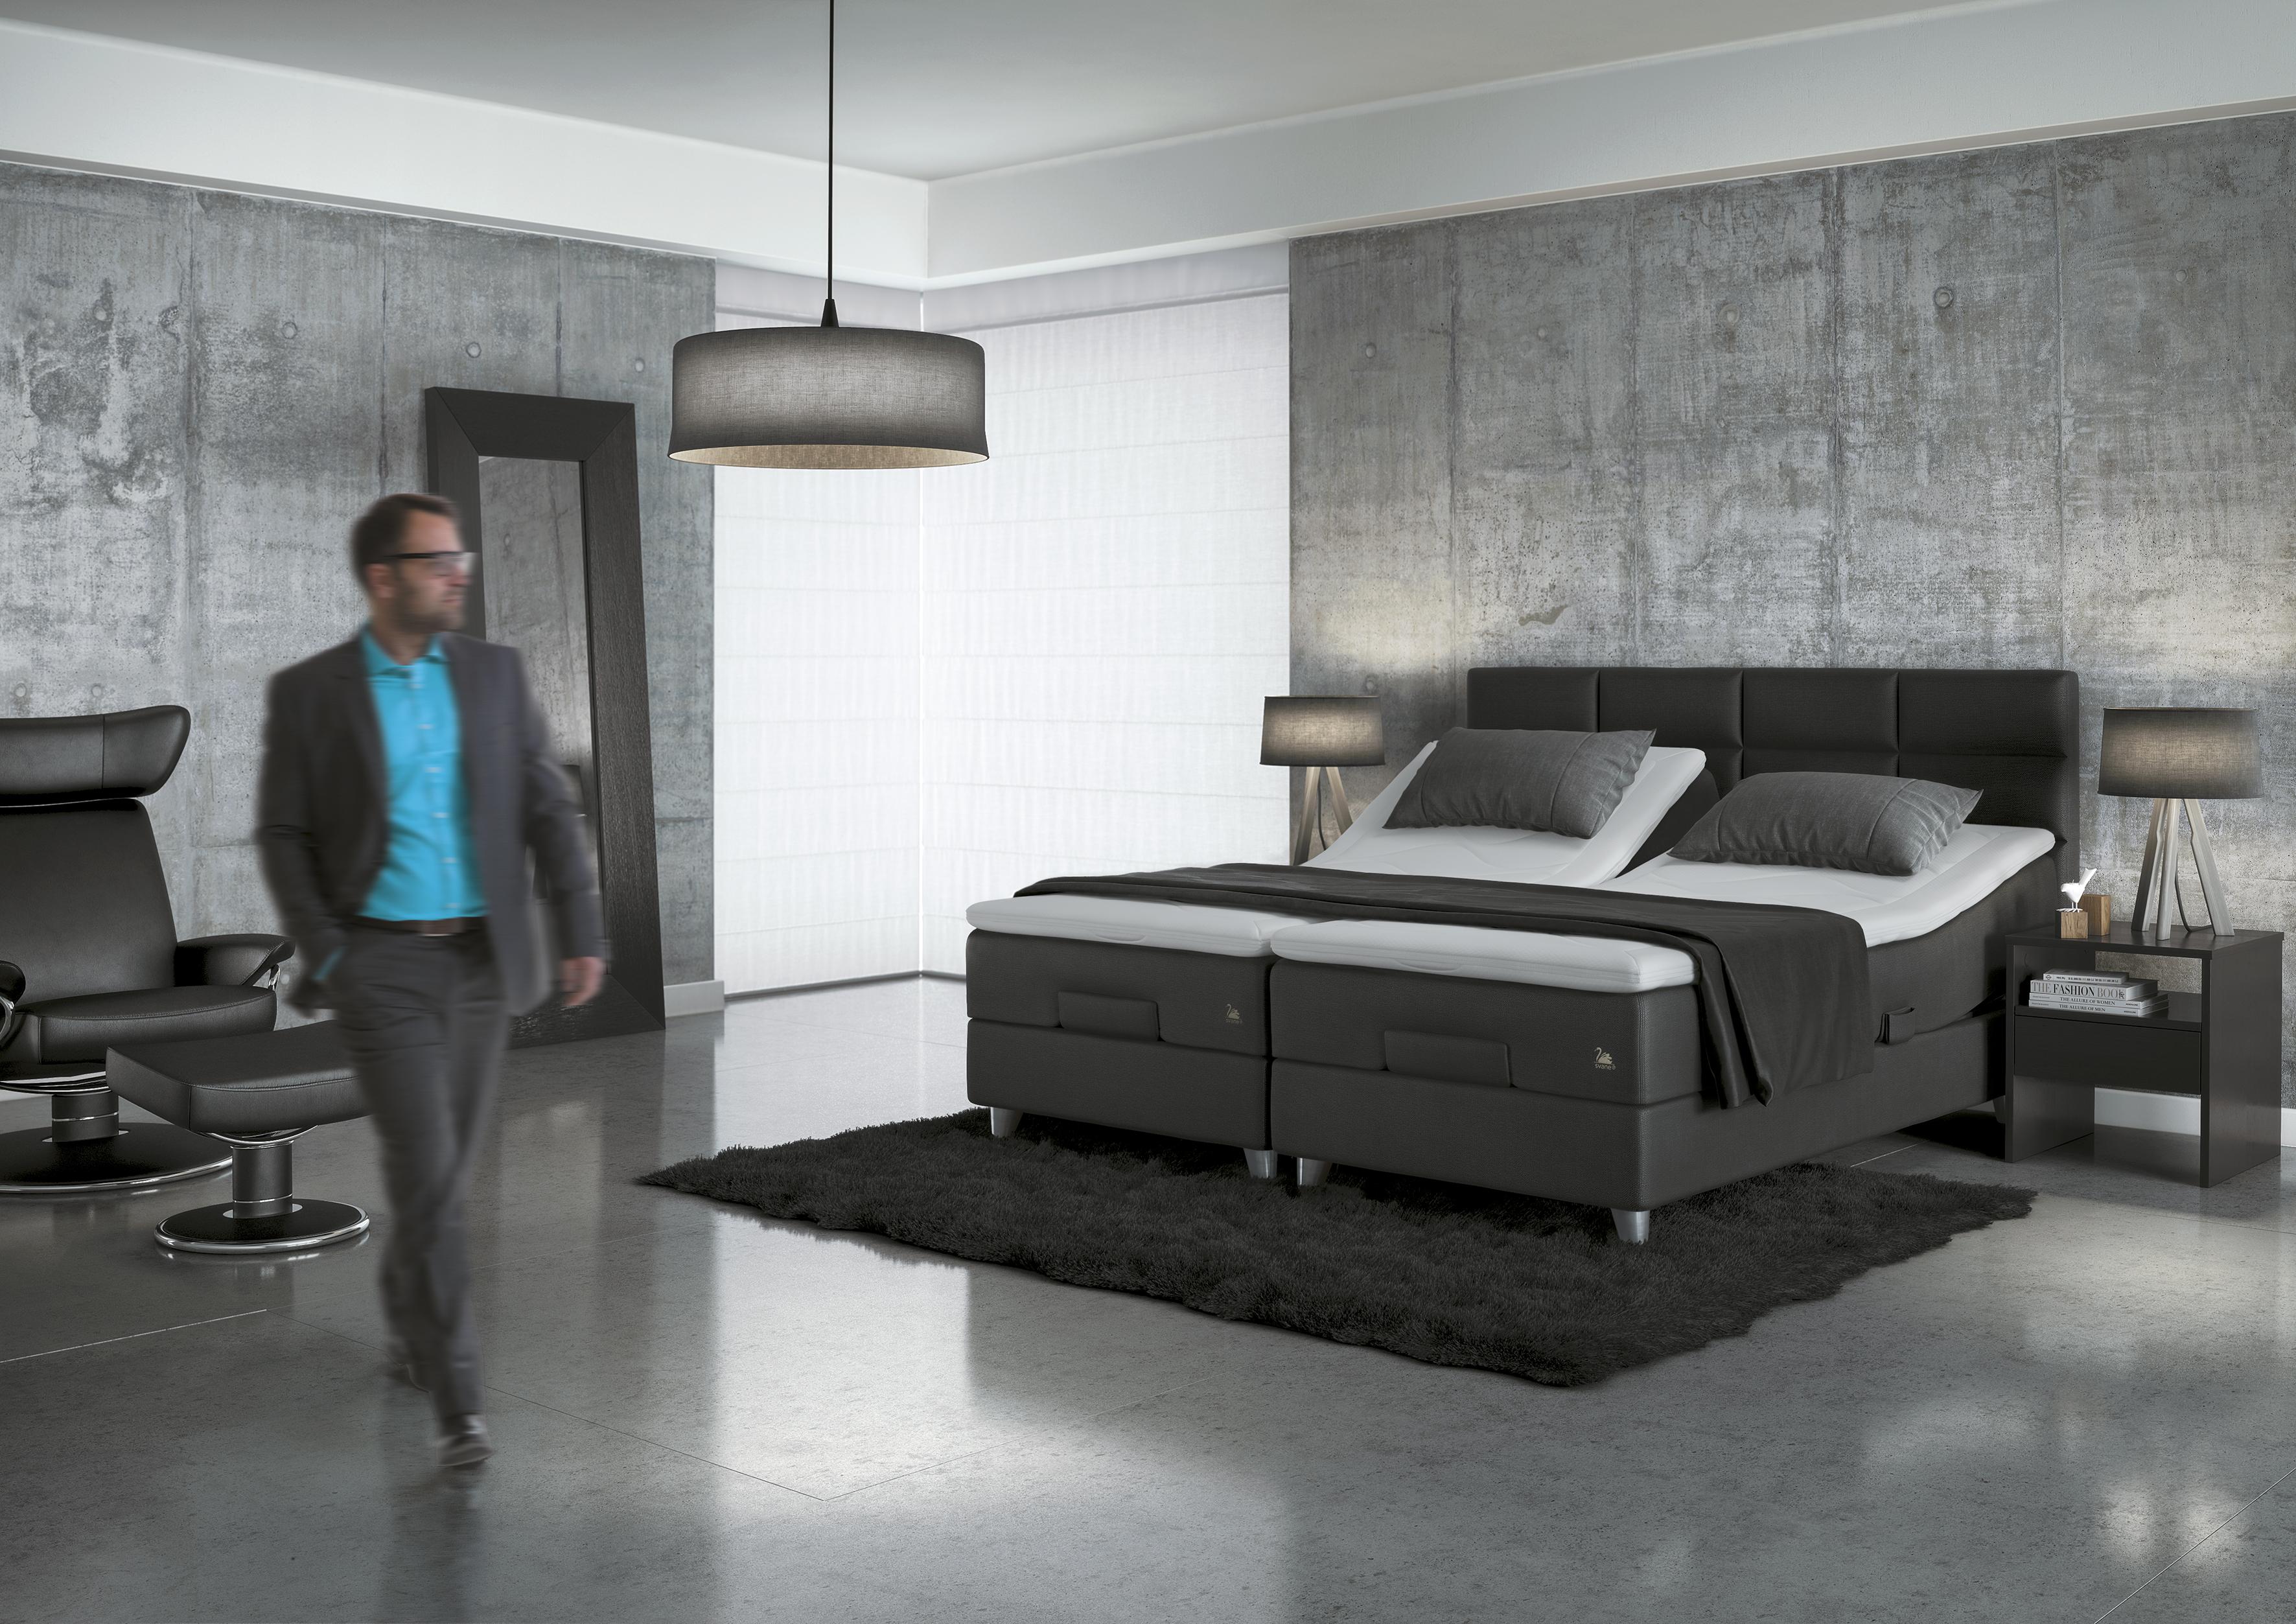 svane motion 5000 boxspring verstellbarer unterbau betten heise. Black Bedroom Furniture Sets. Home Design Ideas